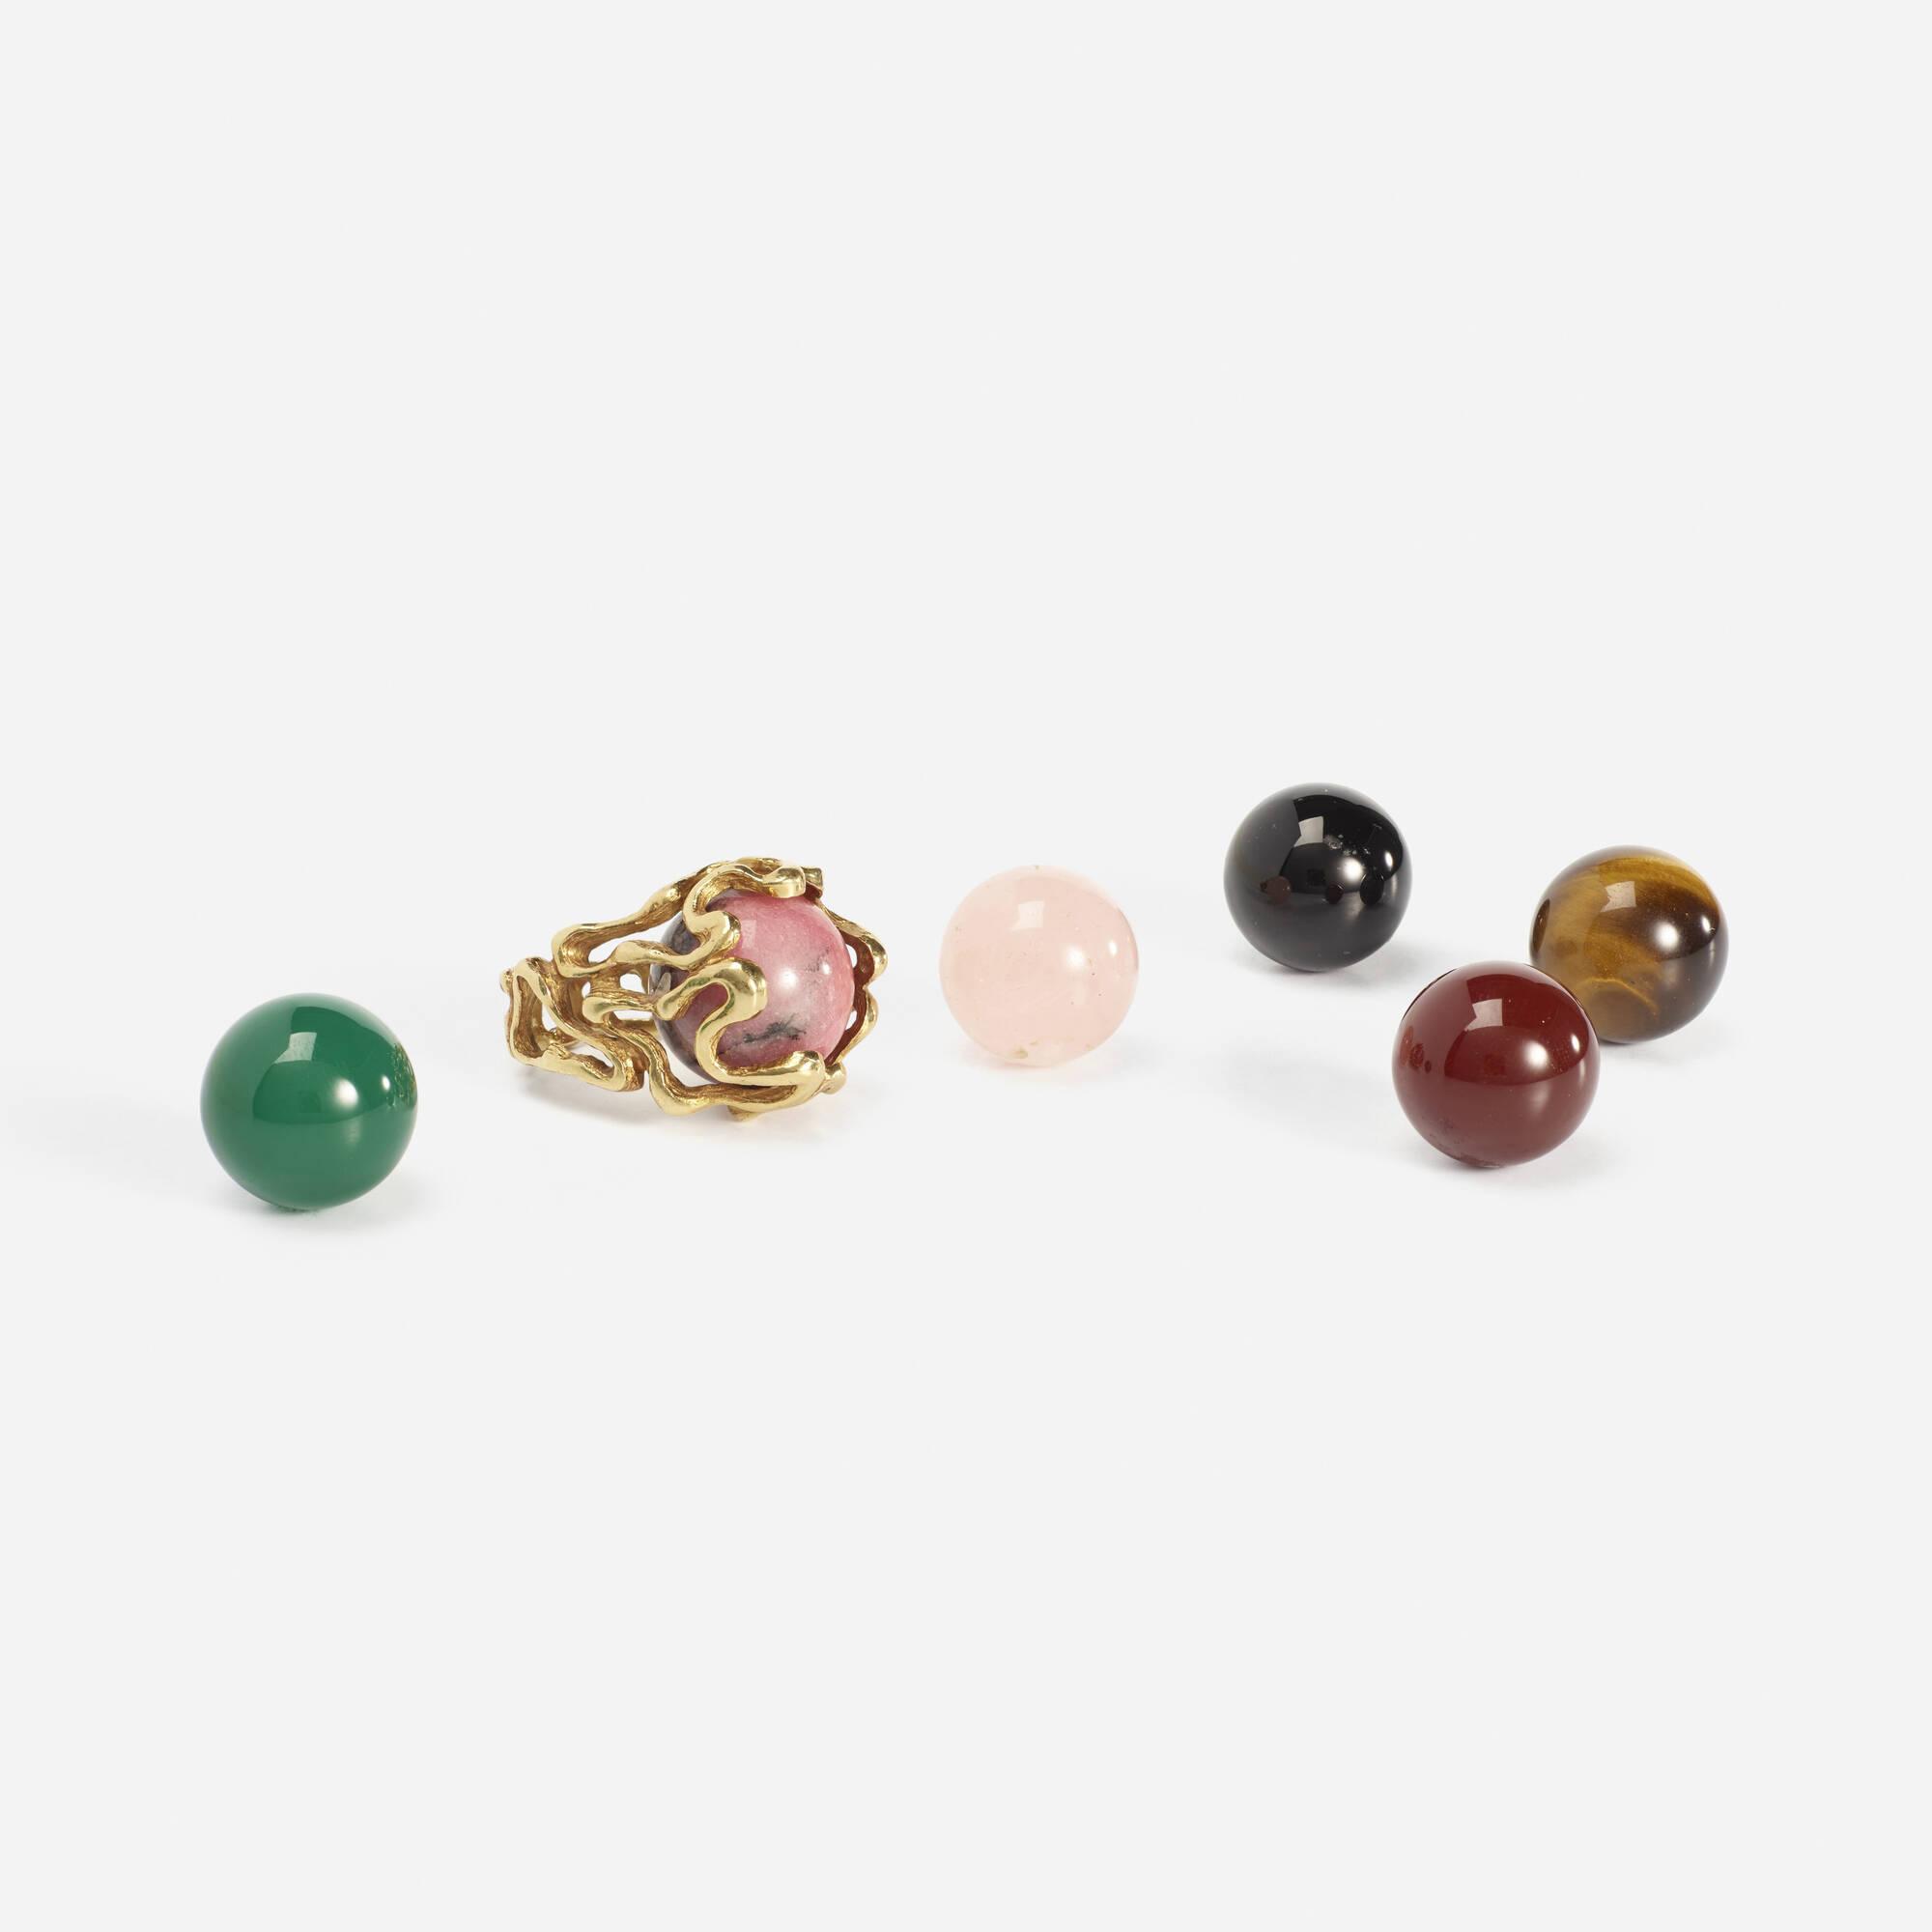 285: Gilbert Albert / A gold ring with interchangeable gemstones (2 of 2)